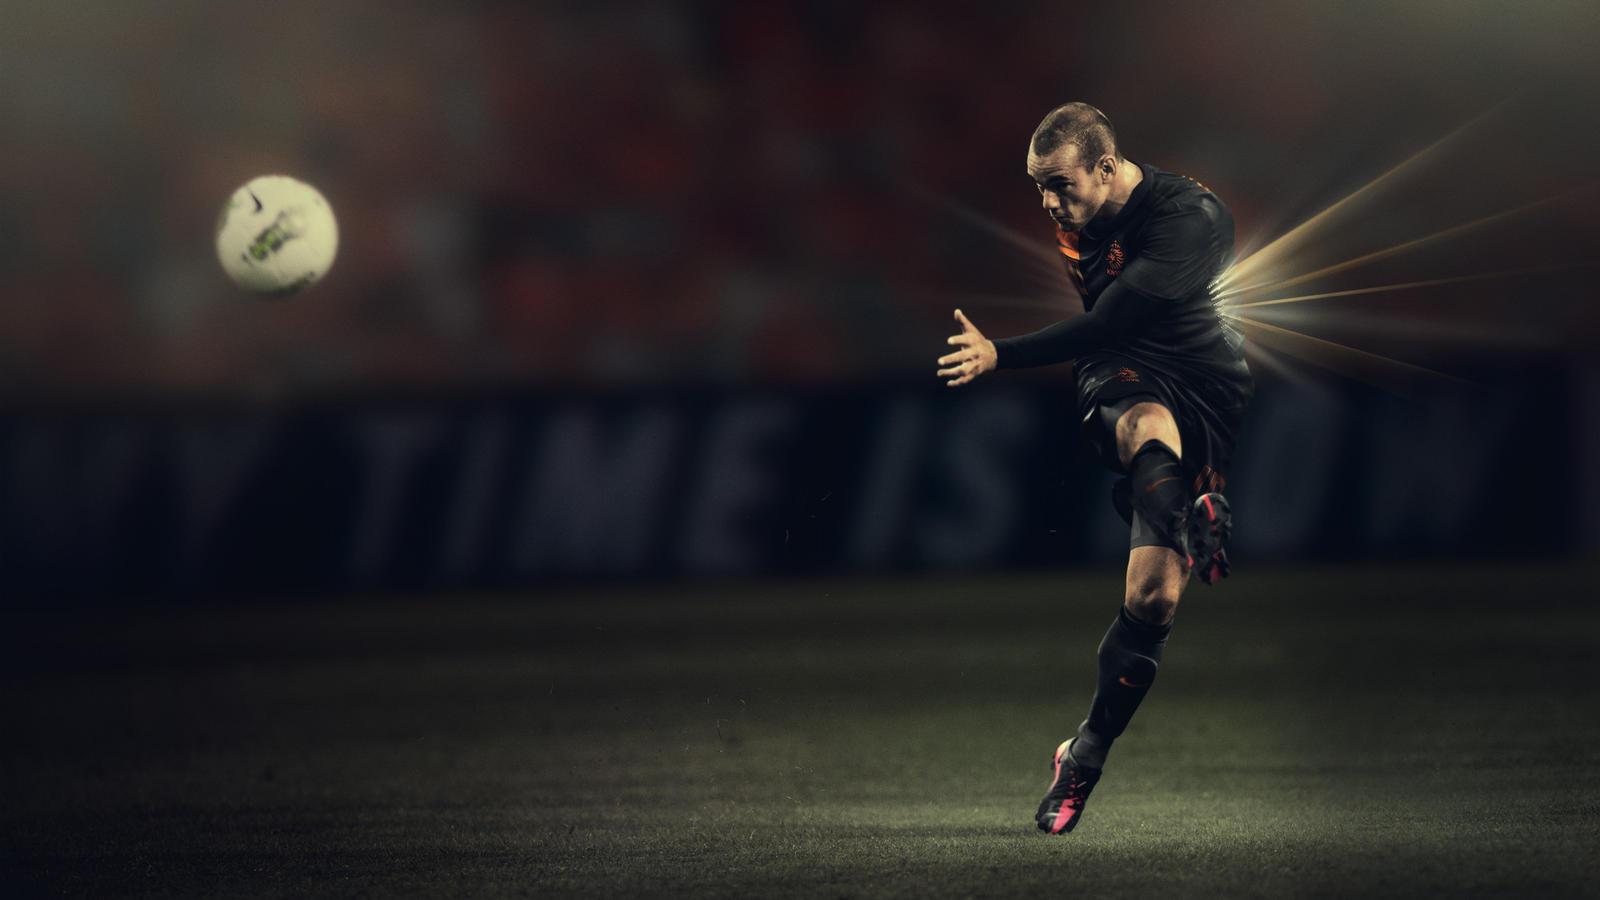 Sport Wallpaper Cheap Nike: Nike Football Unveils Netherlands Away National Team Kit